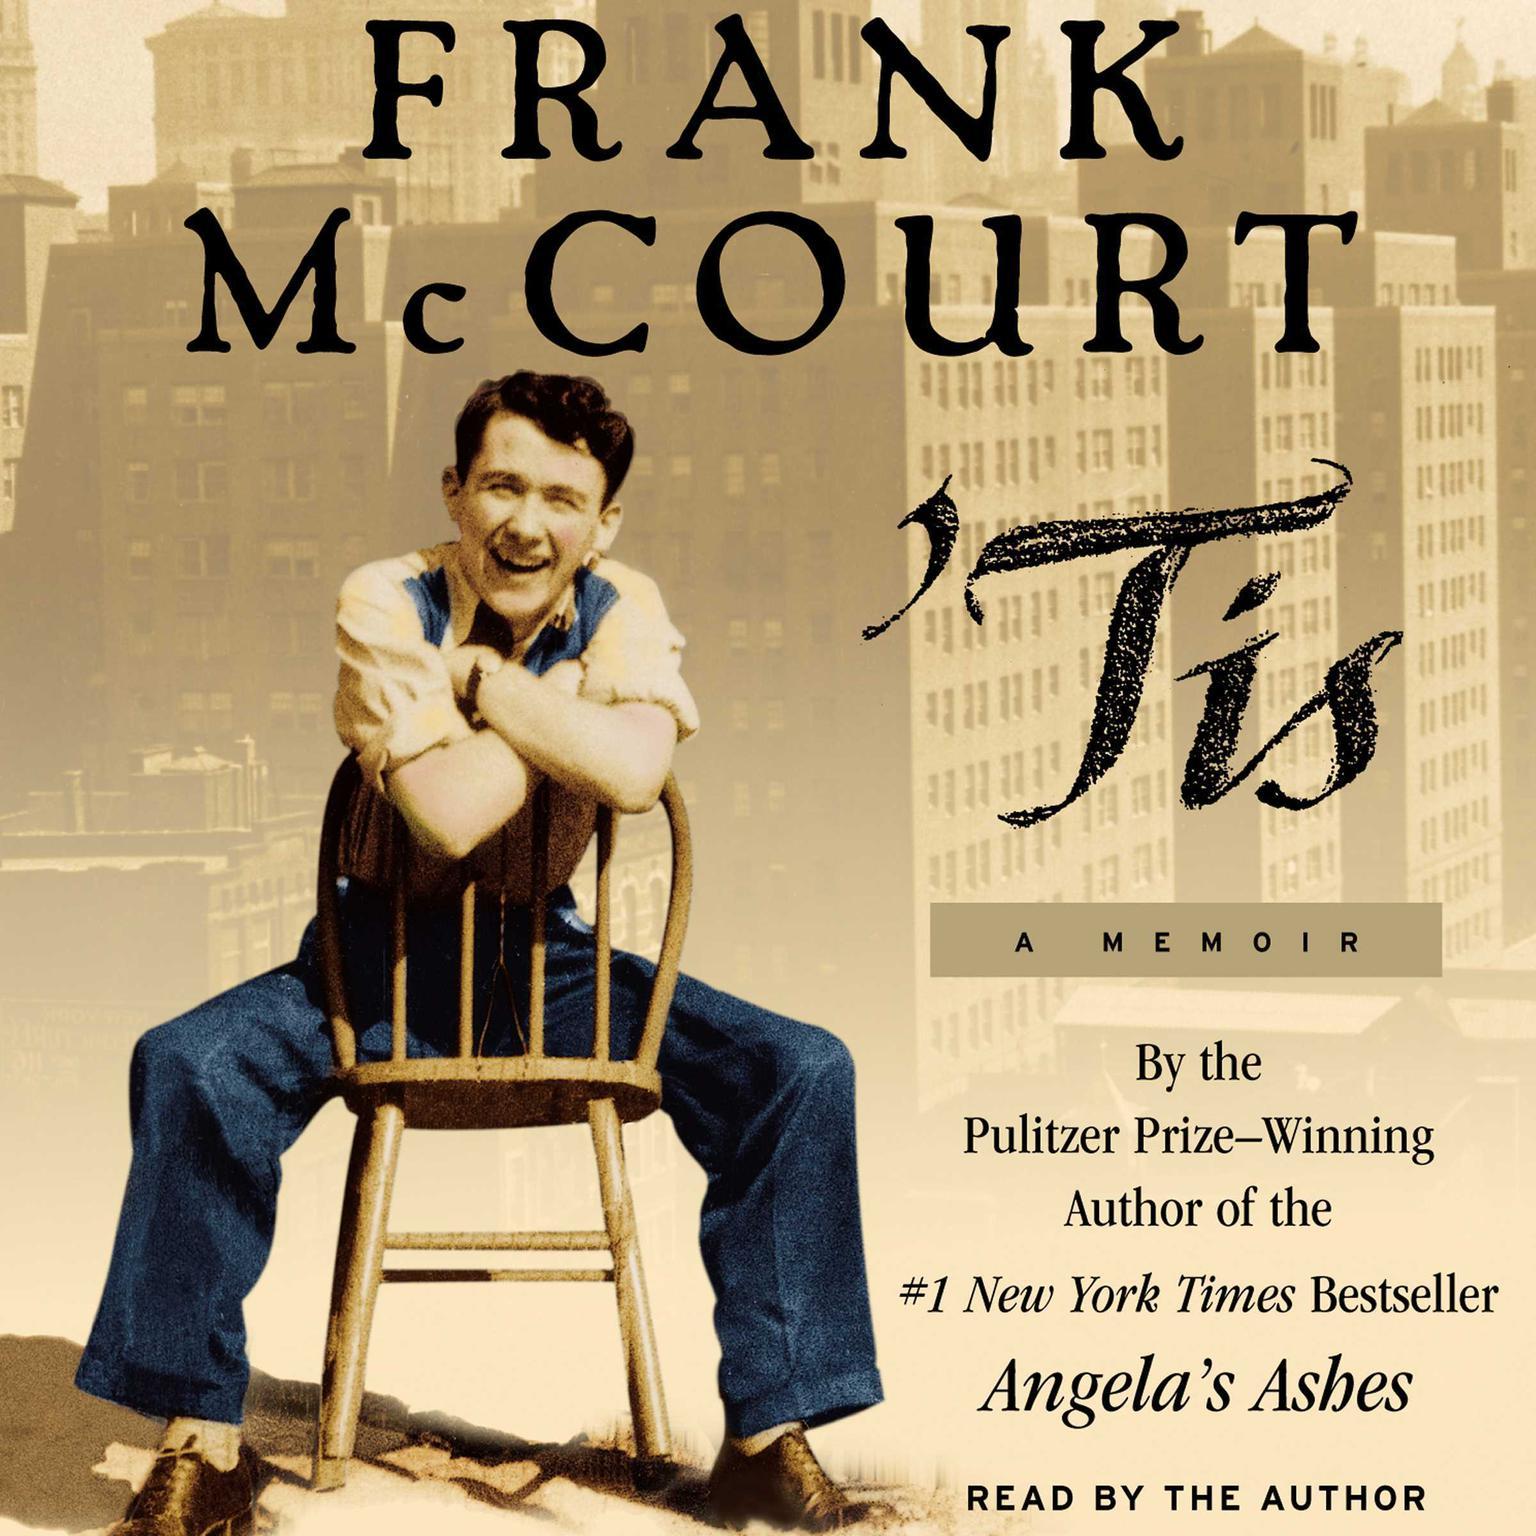 Printable 'Tis (Abridged): A Memoir Audiobook Cover Art